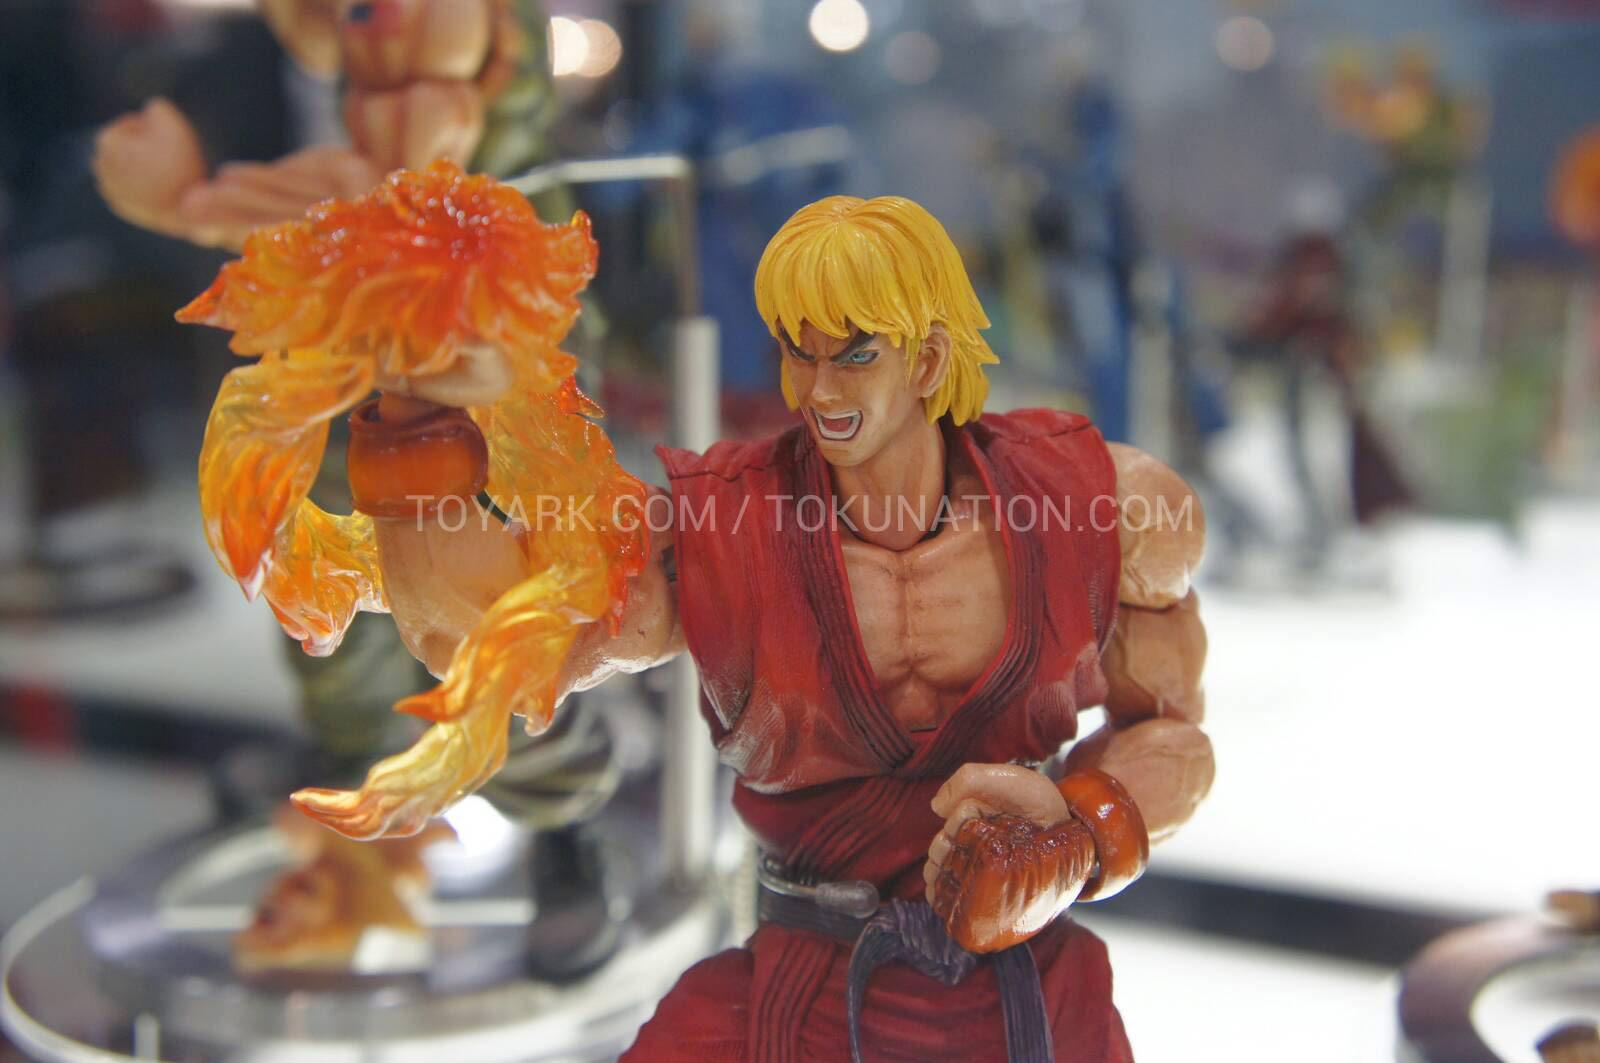 Play Arts Kai positionable figurines #01